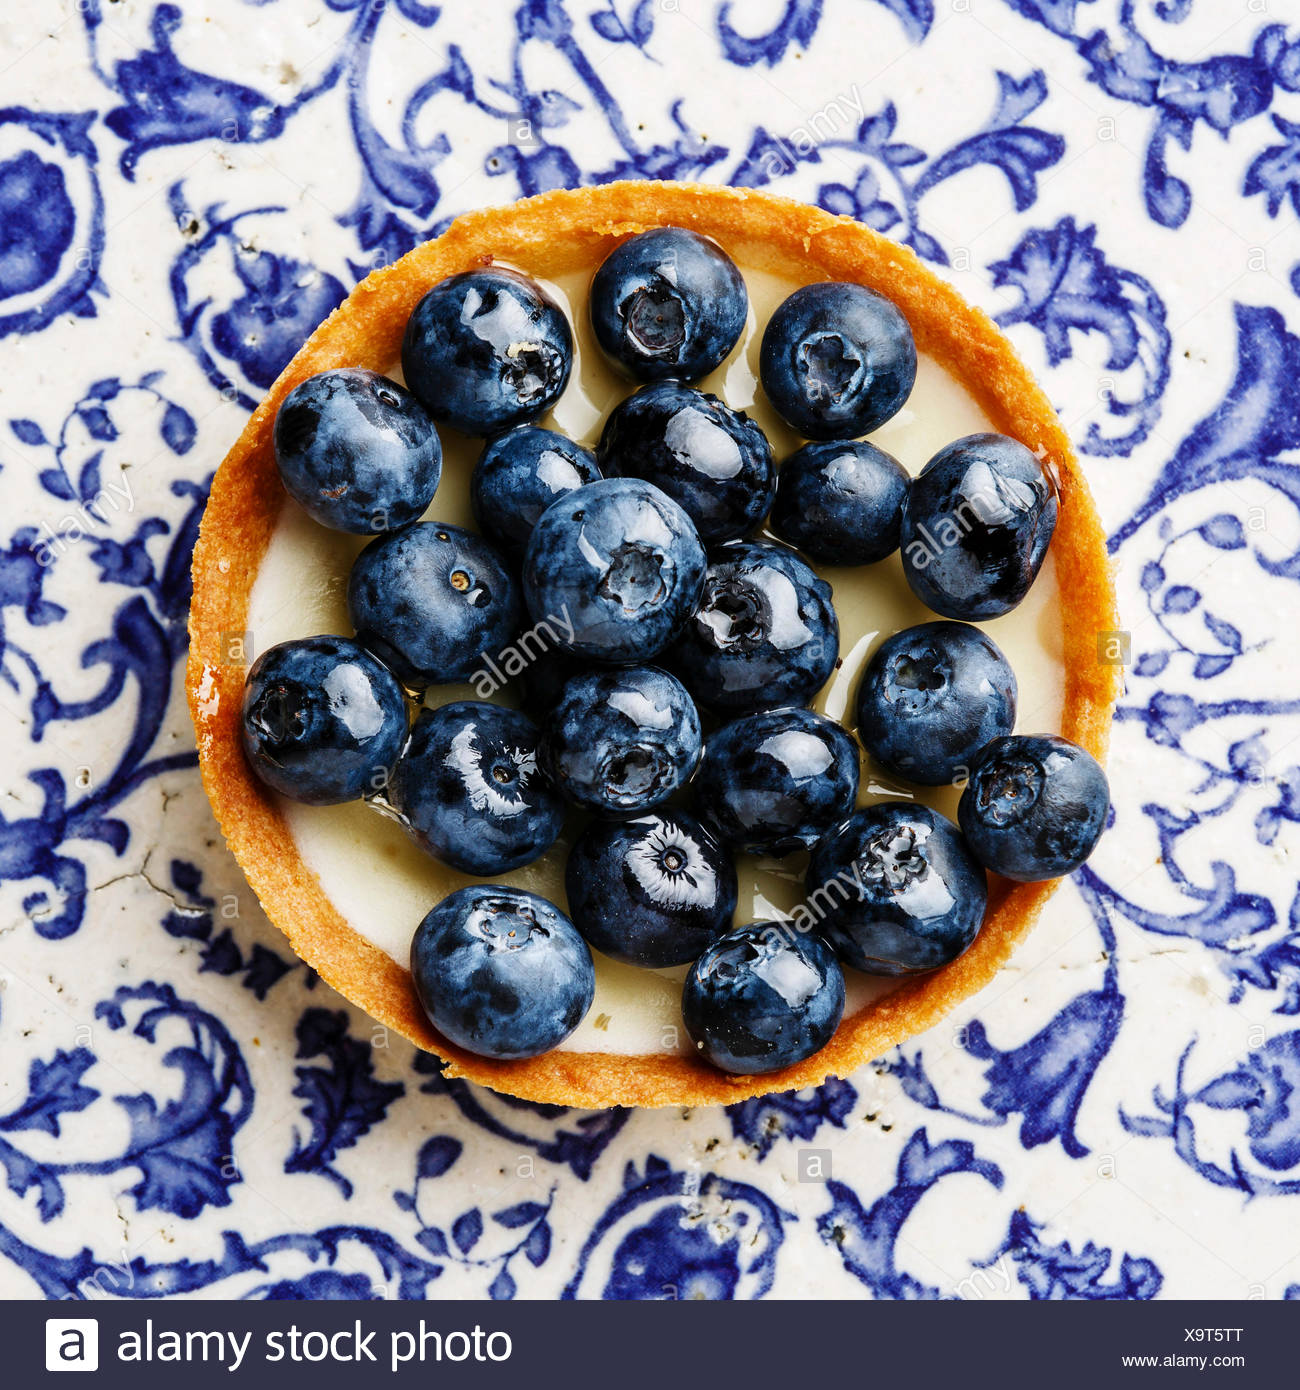 Blueberry tart on blue ornament background - Stock Image